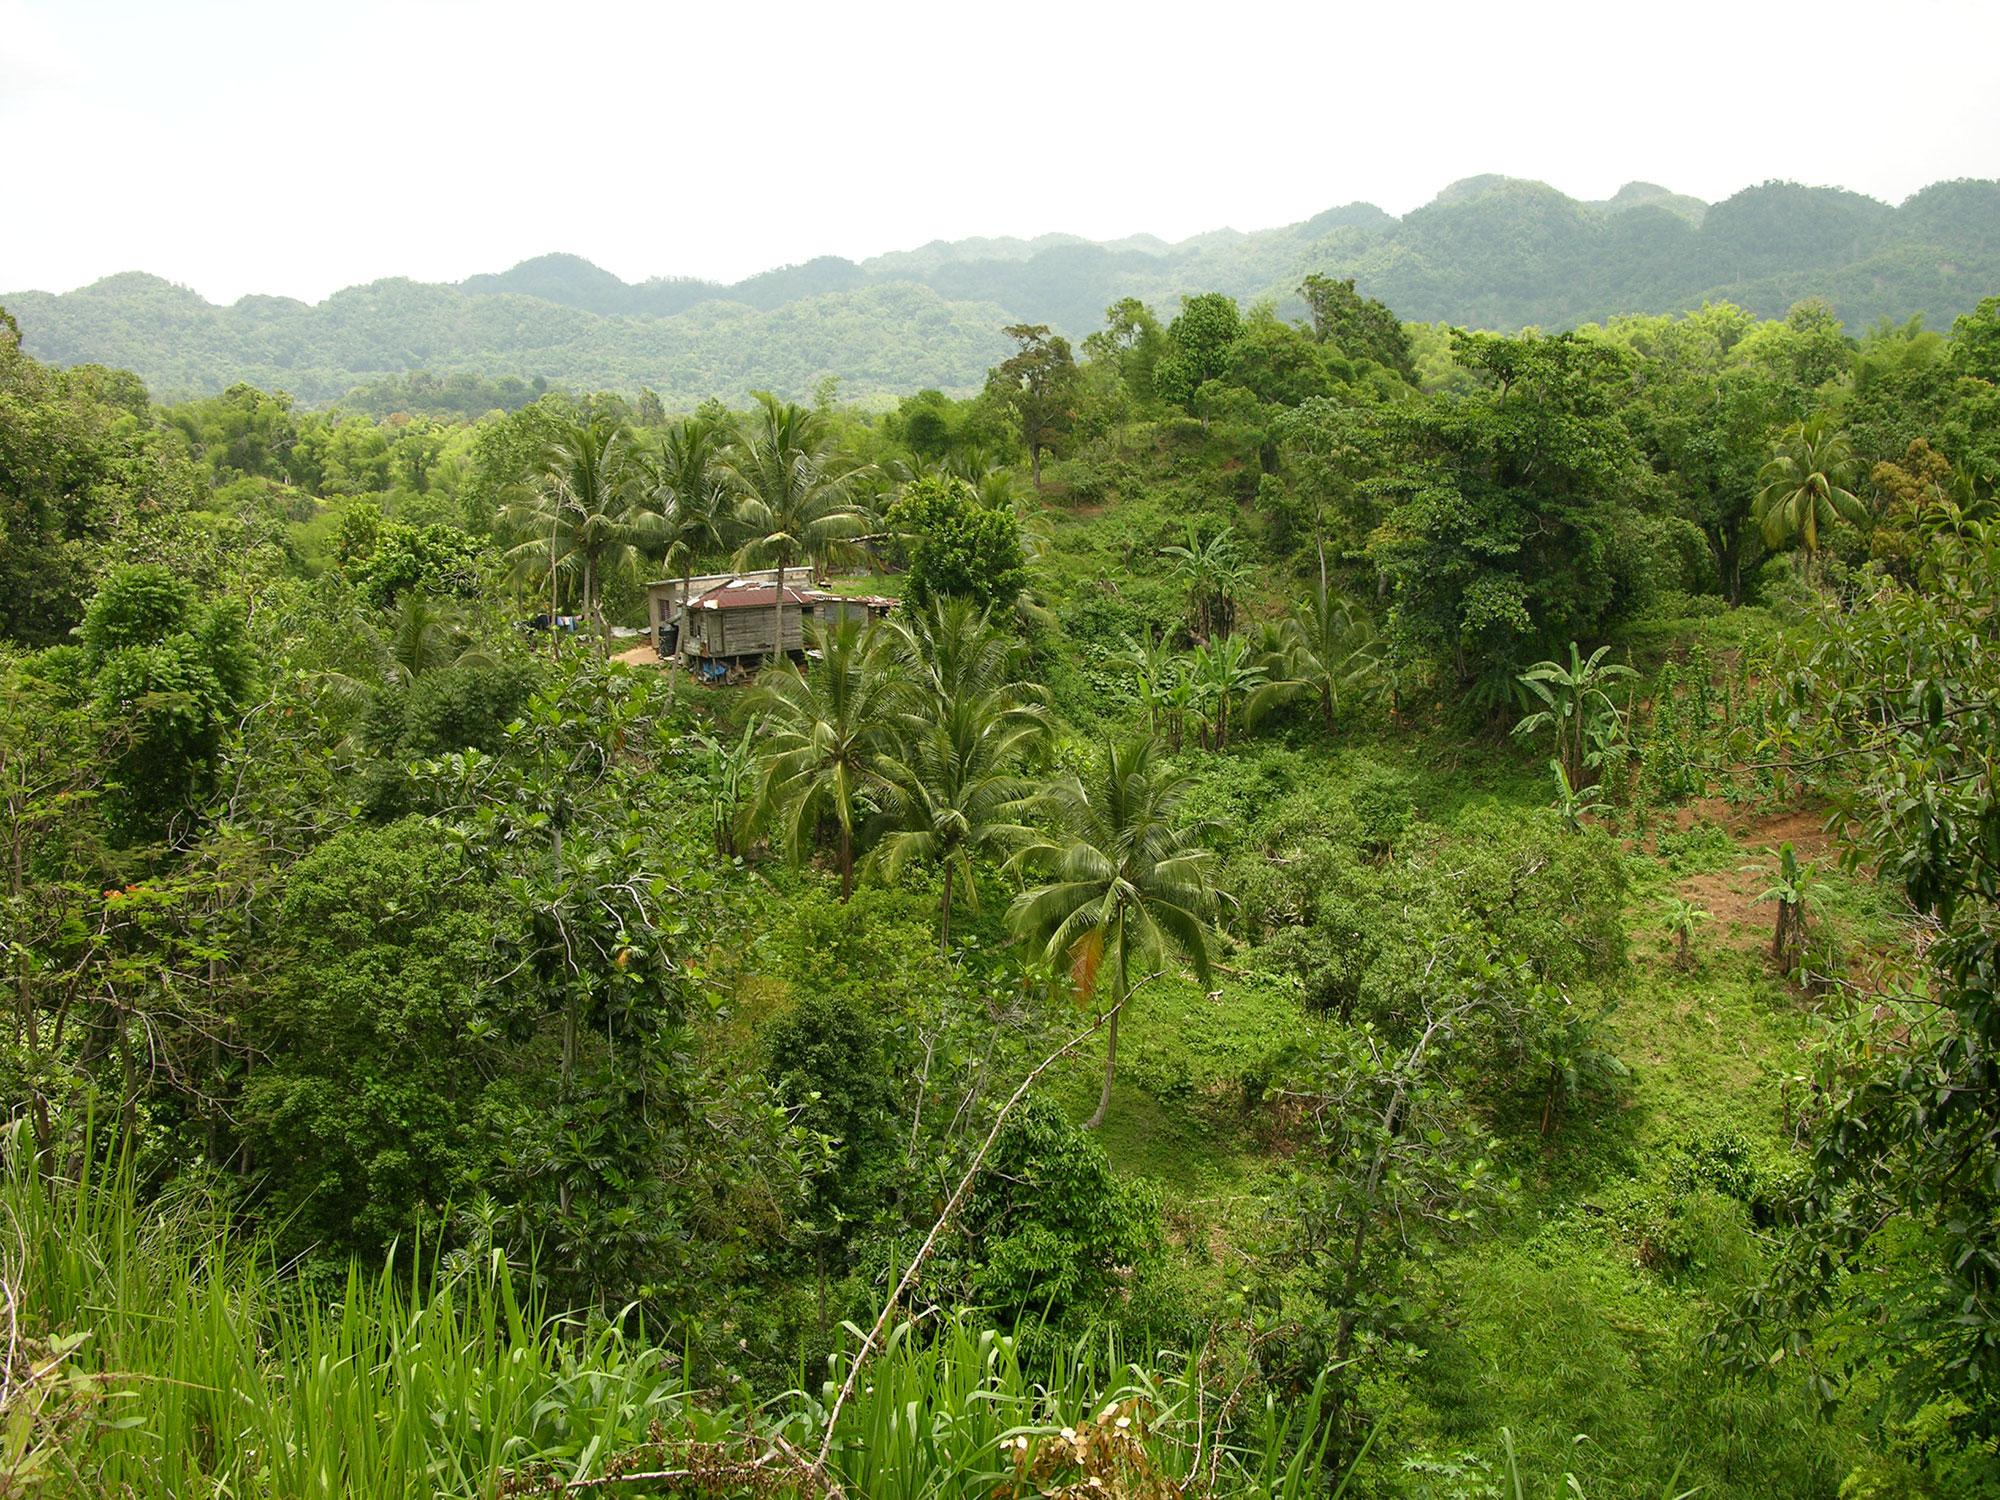 Outdoors sex spain jungle legal